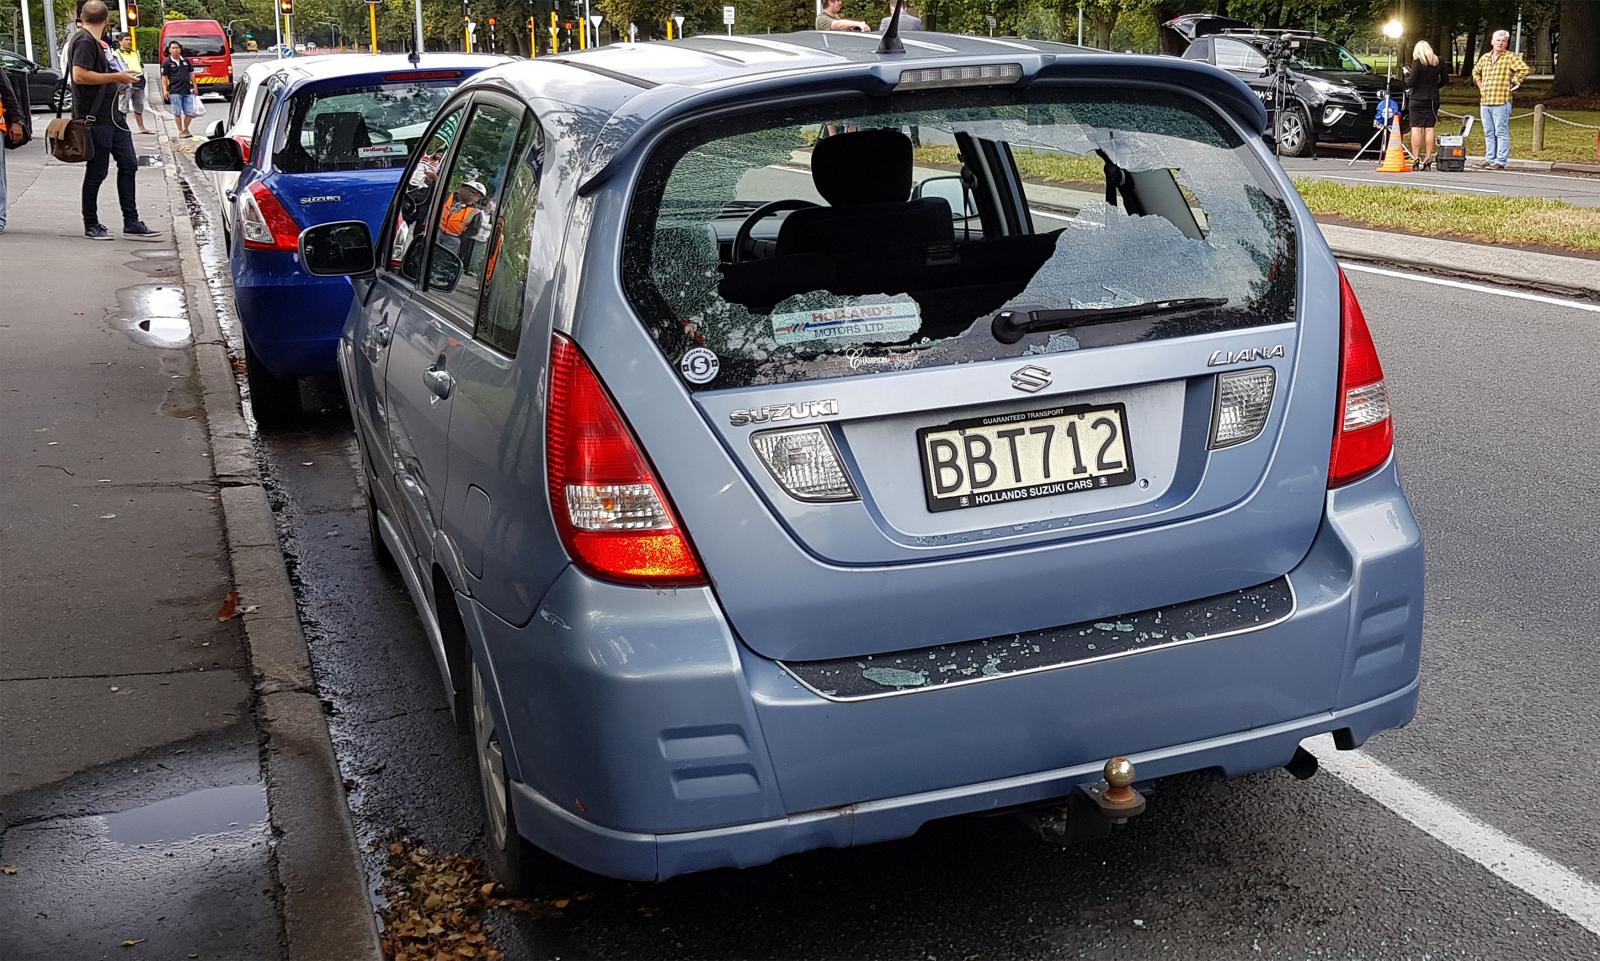 Christchurch Mosque Shooting